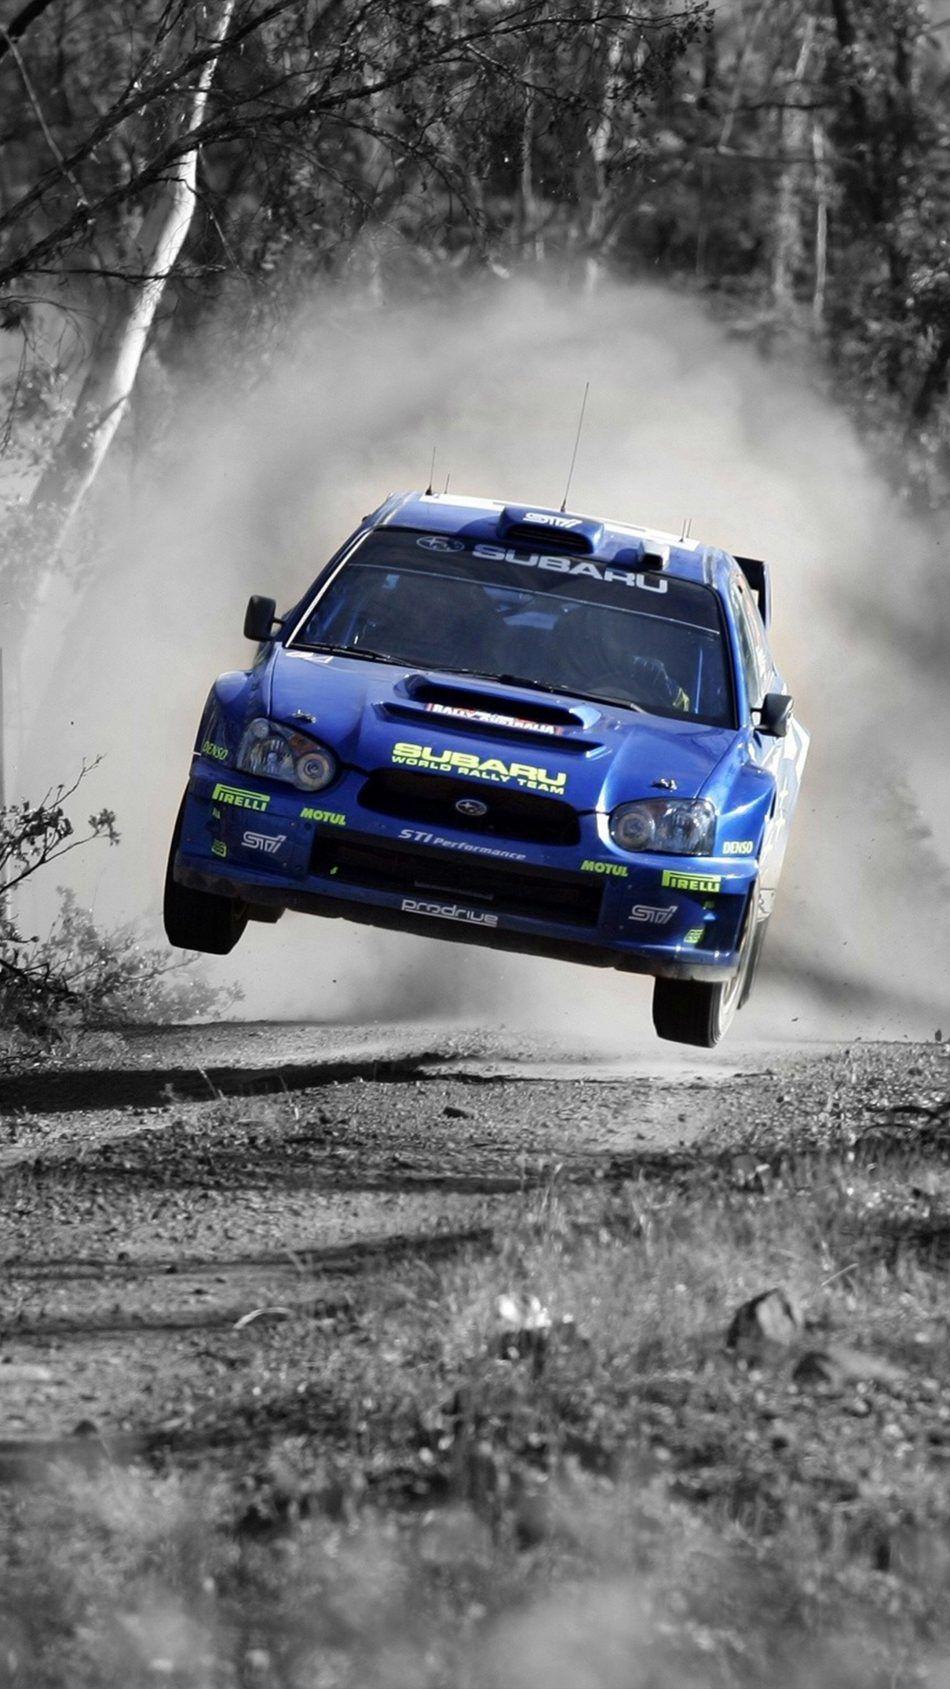 Car Racing Off Road Subaru Rally Rally Car Subaru